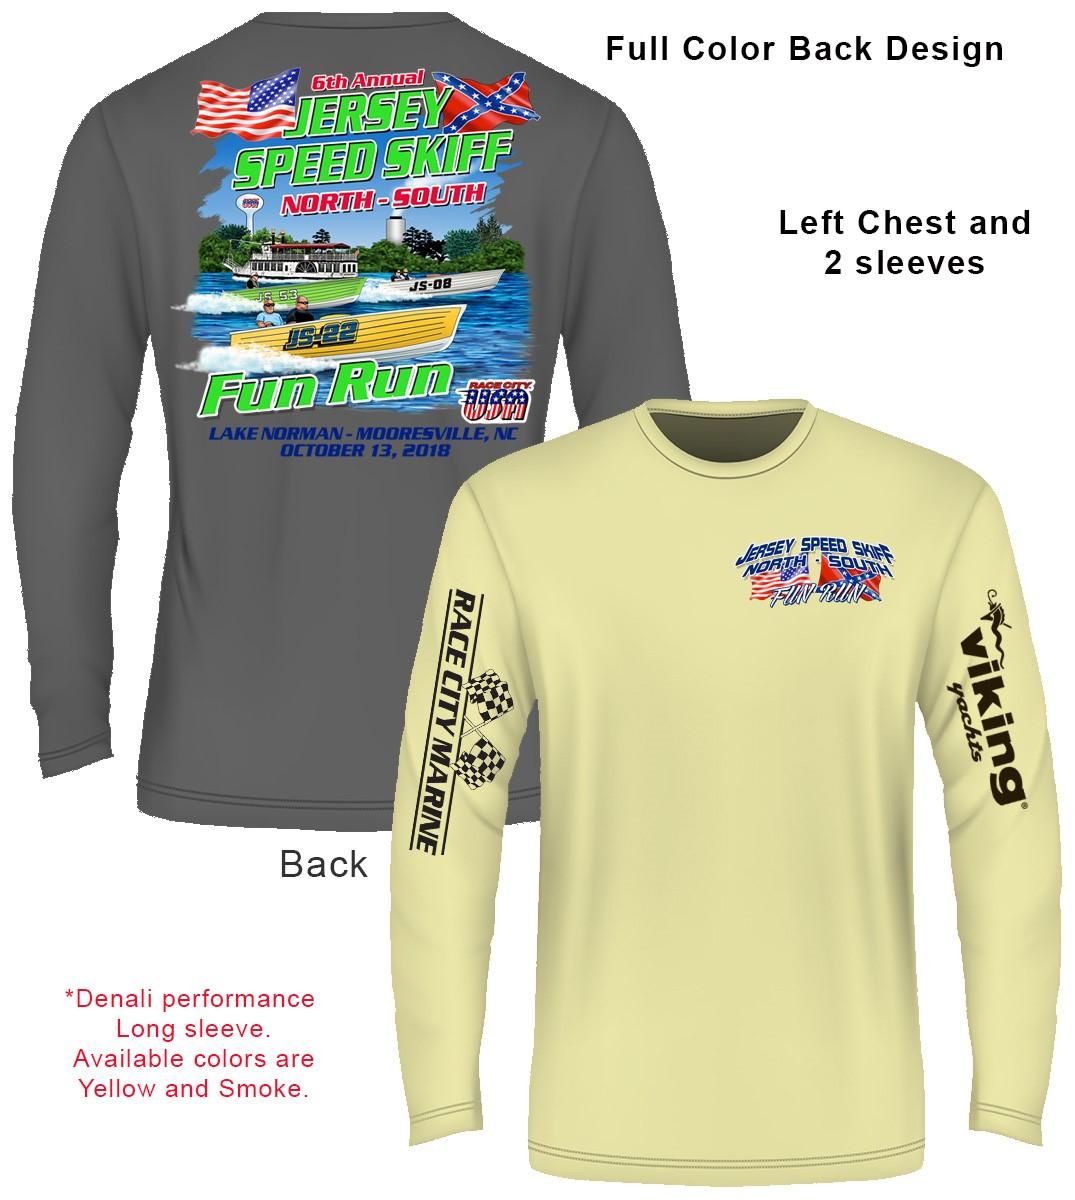 c469fcb6 Long Sleeve Performance Shirts - Sport Fishing Shirts and Apparel ...